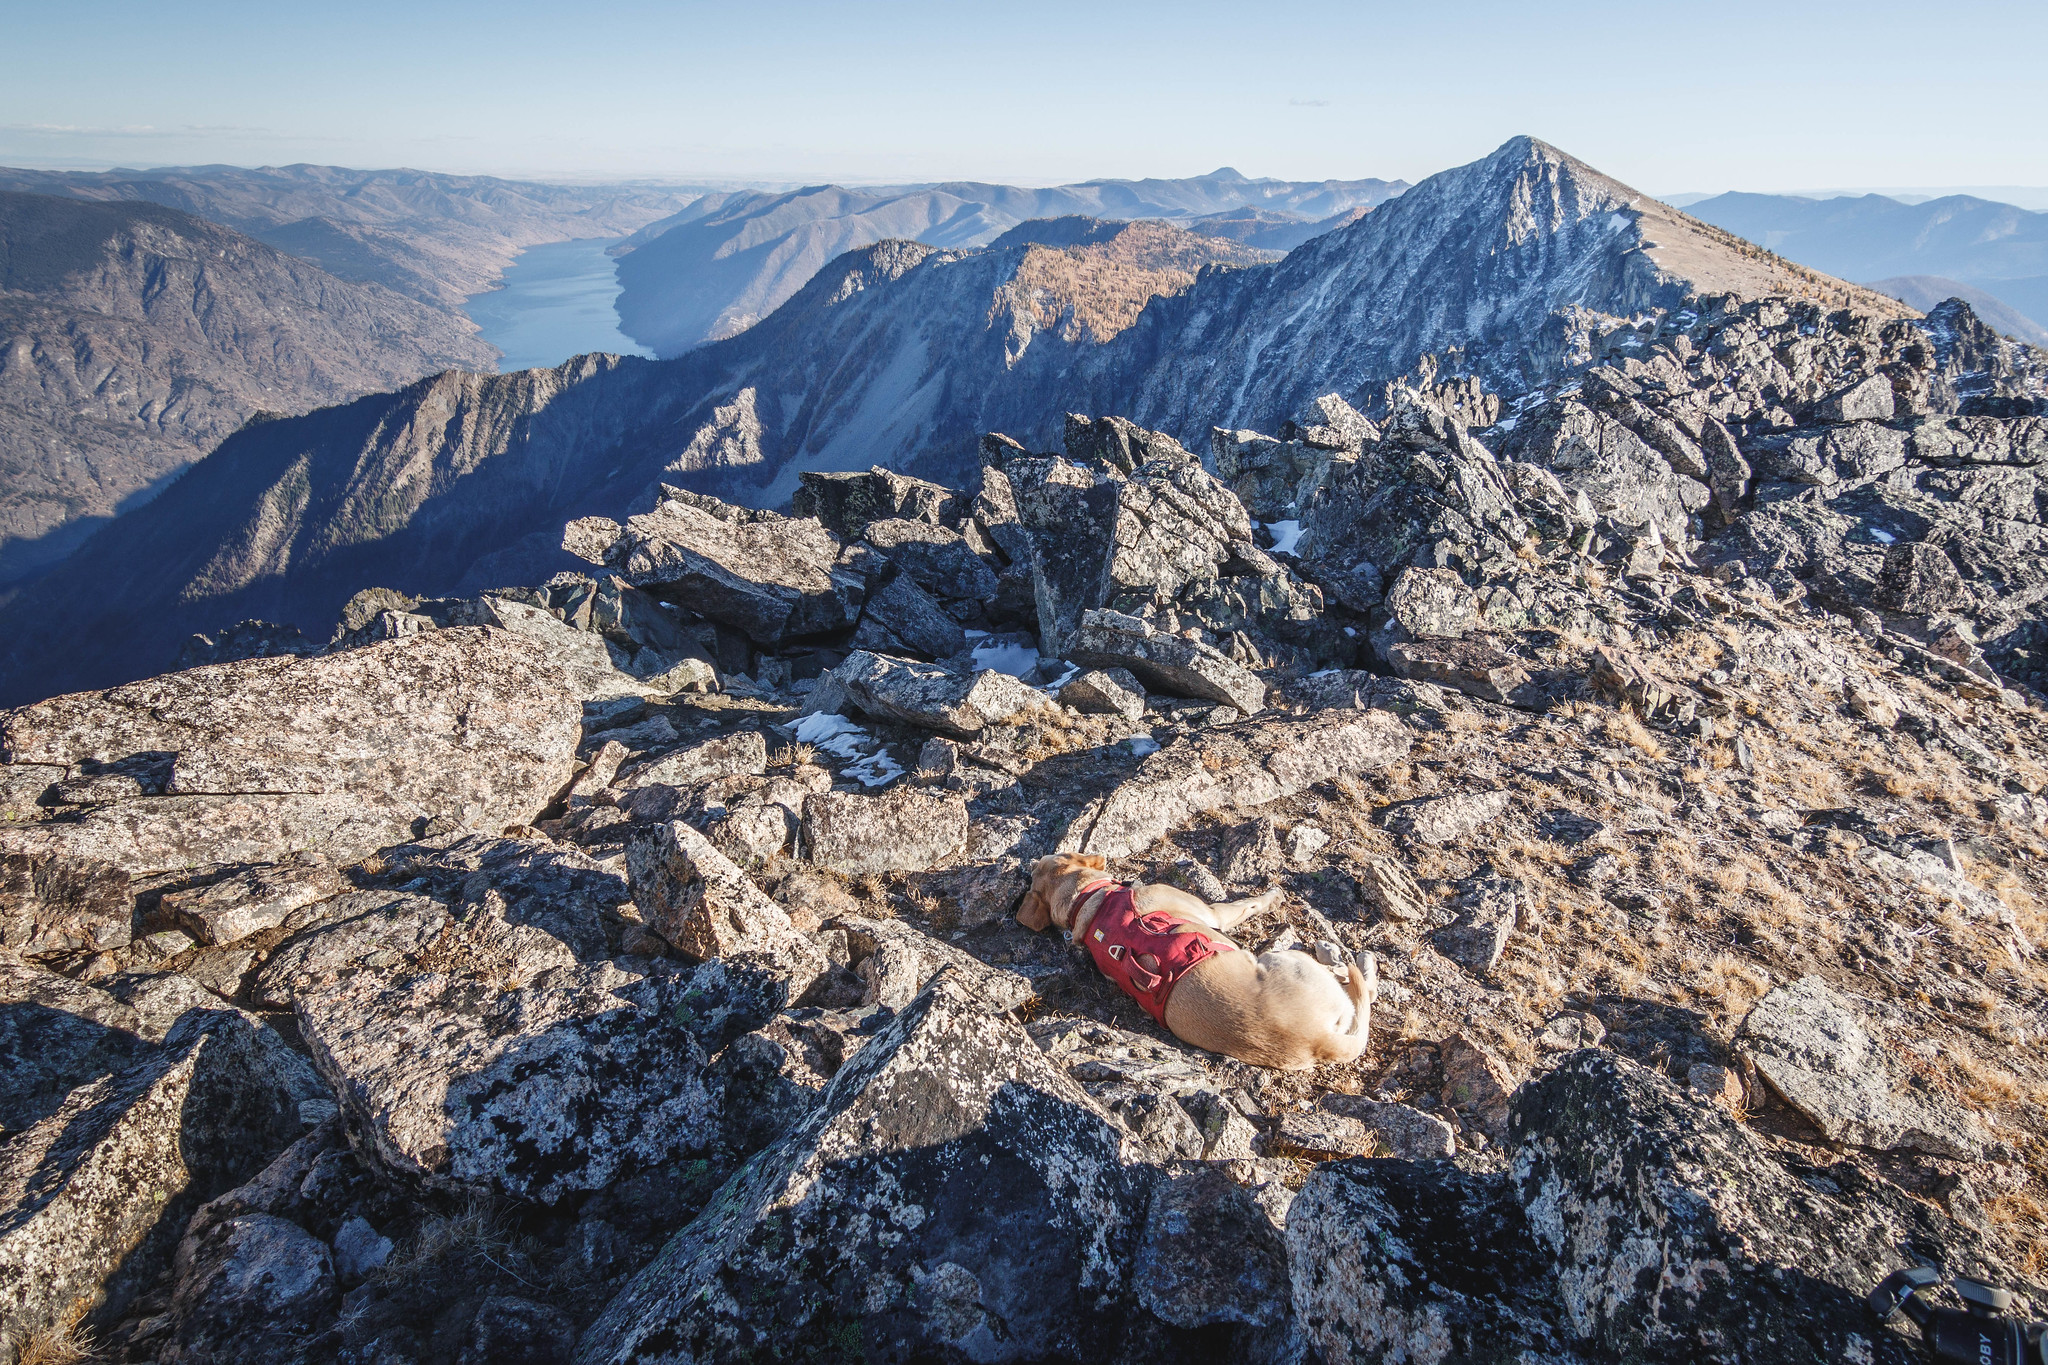 Summit dogs on Squaretop Mountain